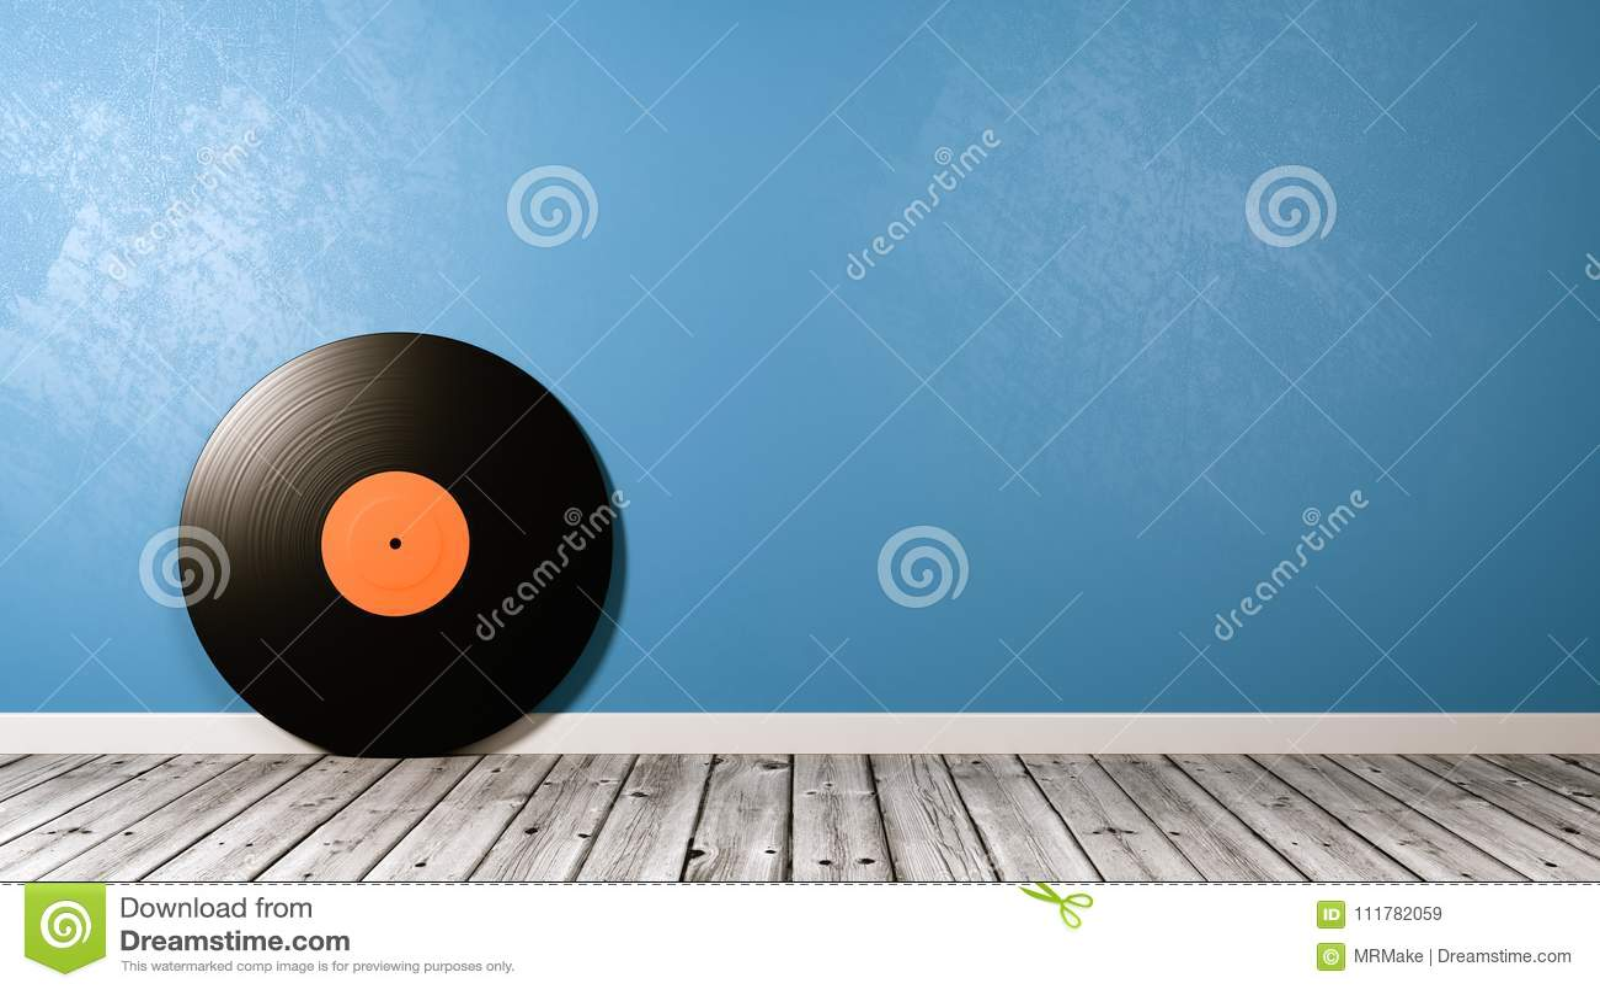 Vinyl Record on Wooden Floor Against Wall